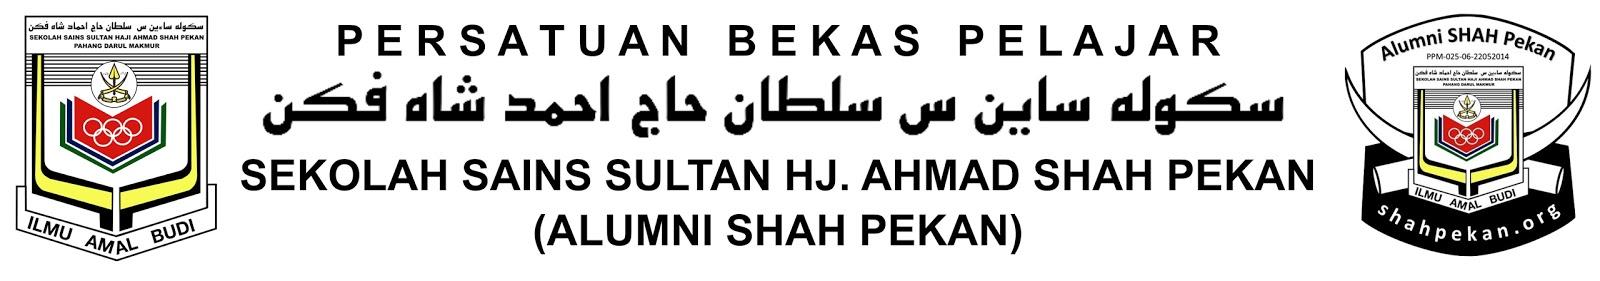 Alumni SHAH Pekan